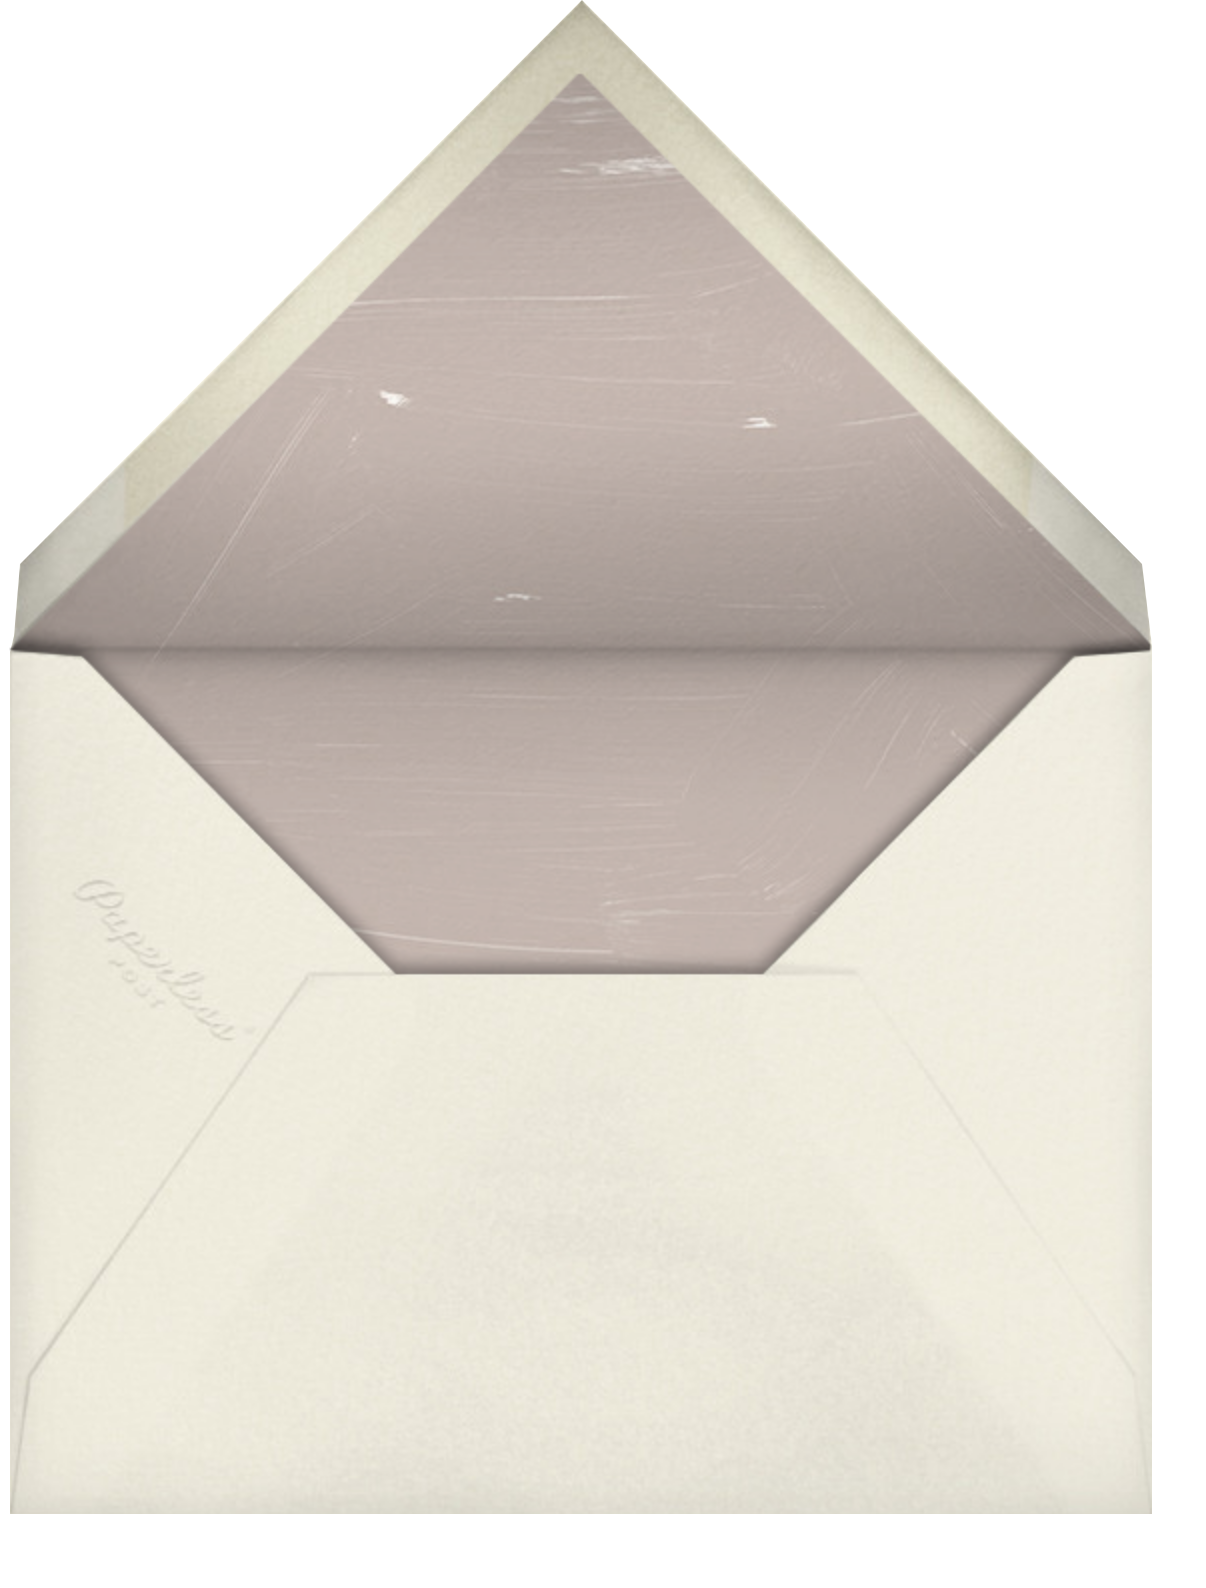 Pampas Grass (Invitation) - Paperless Post - All - envelope back